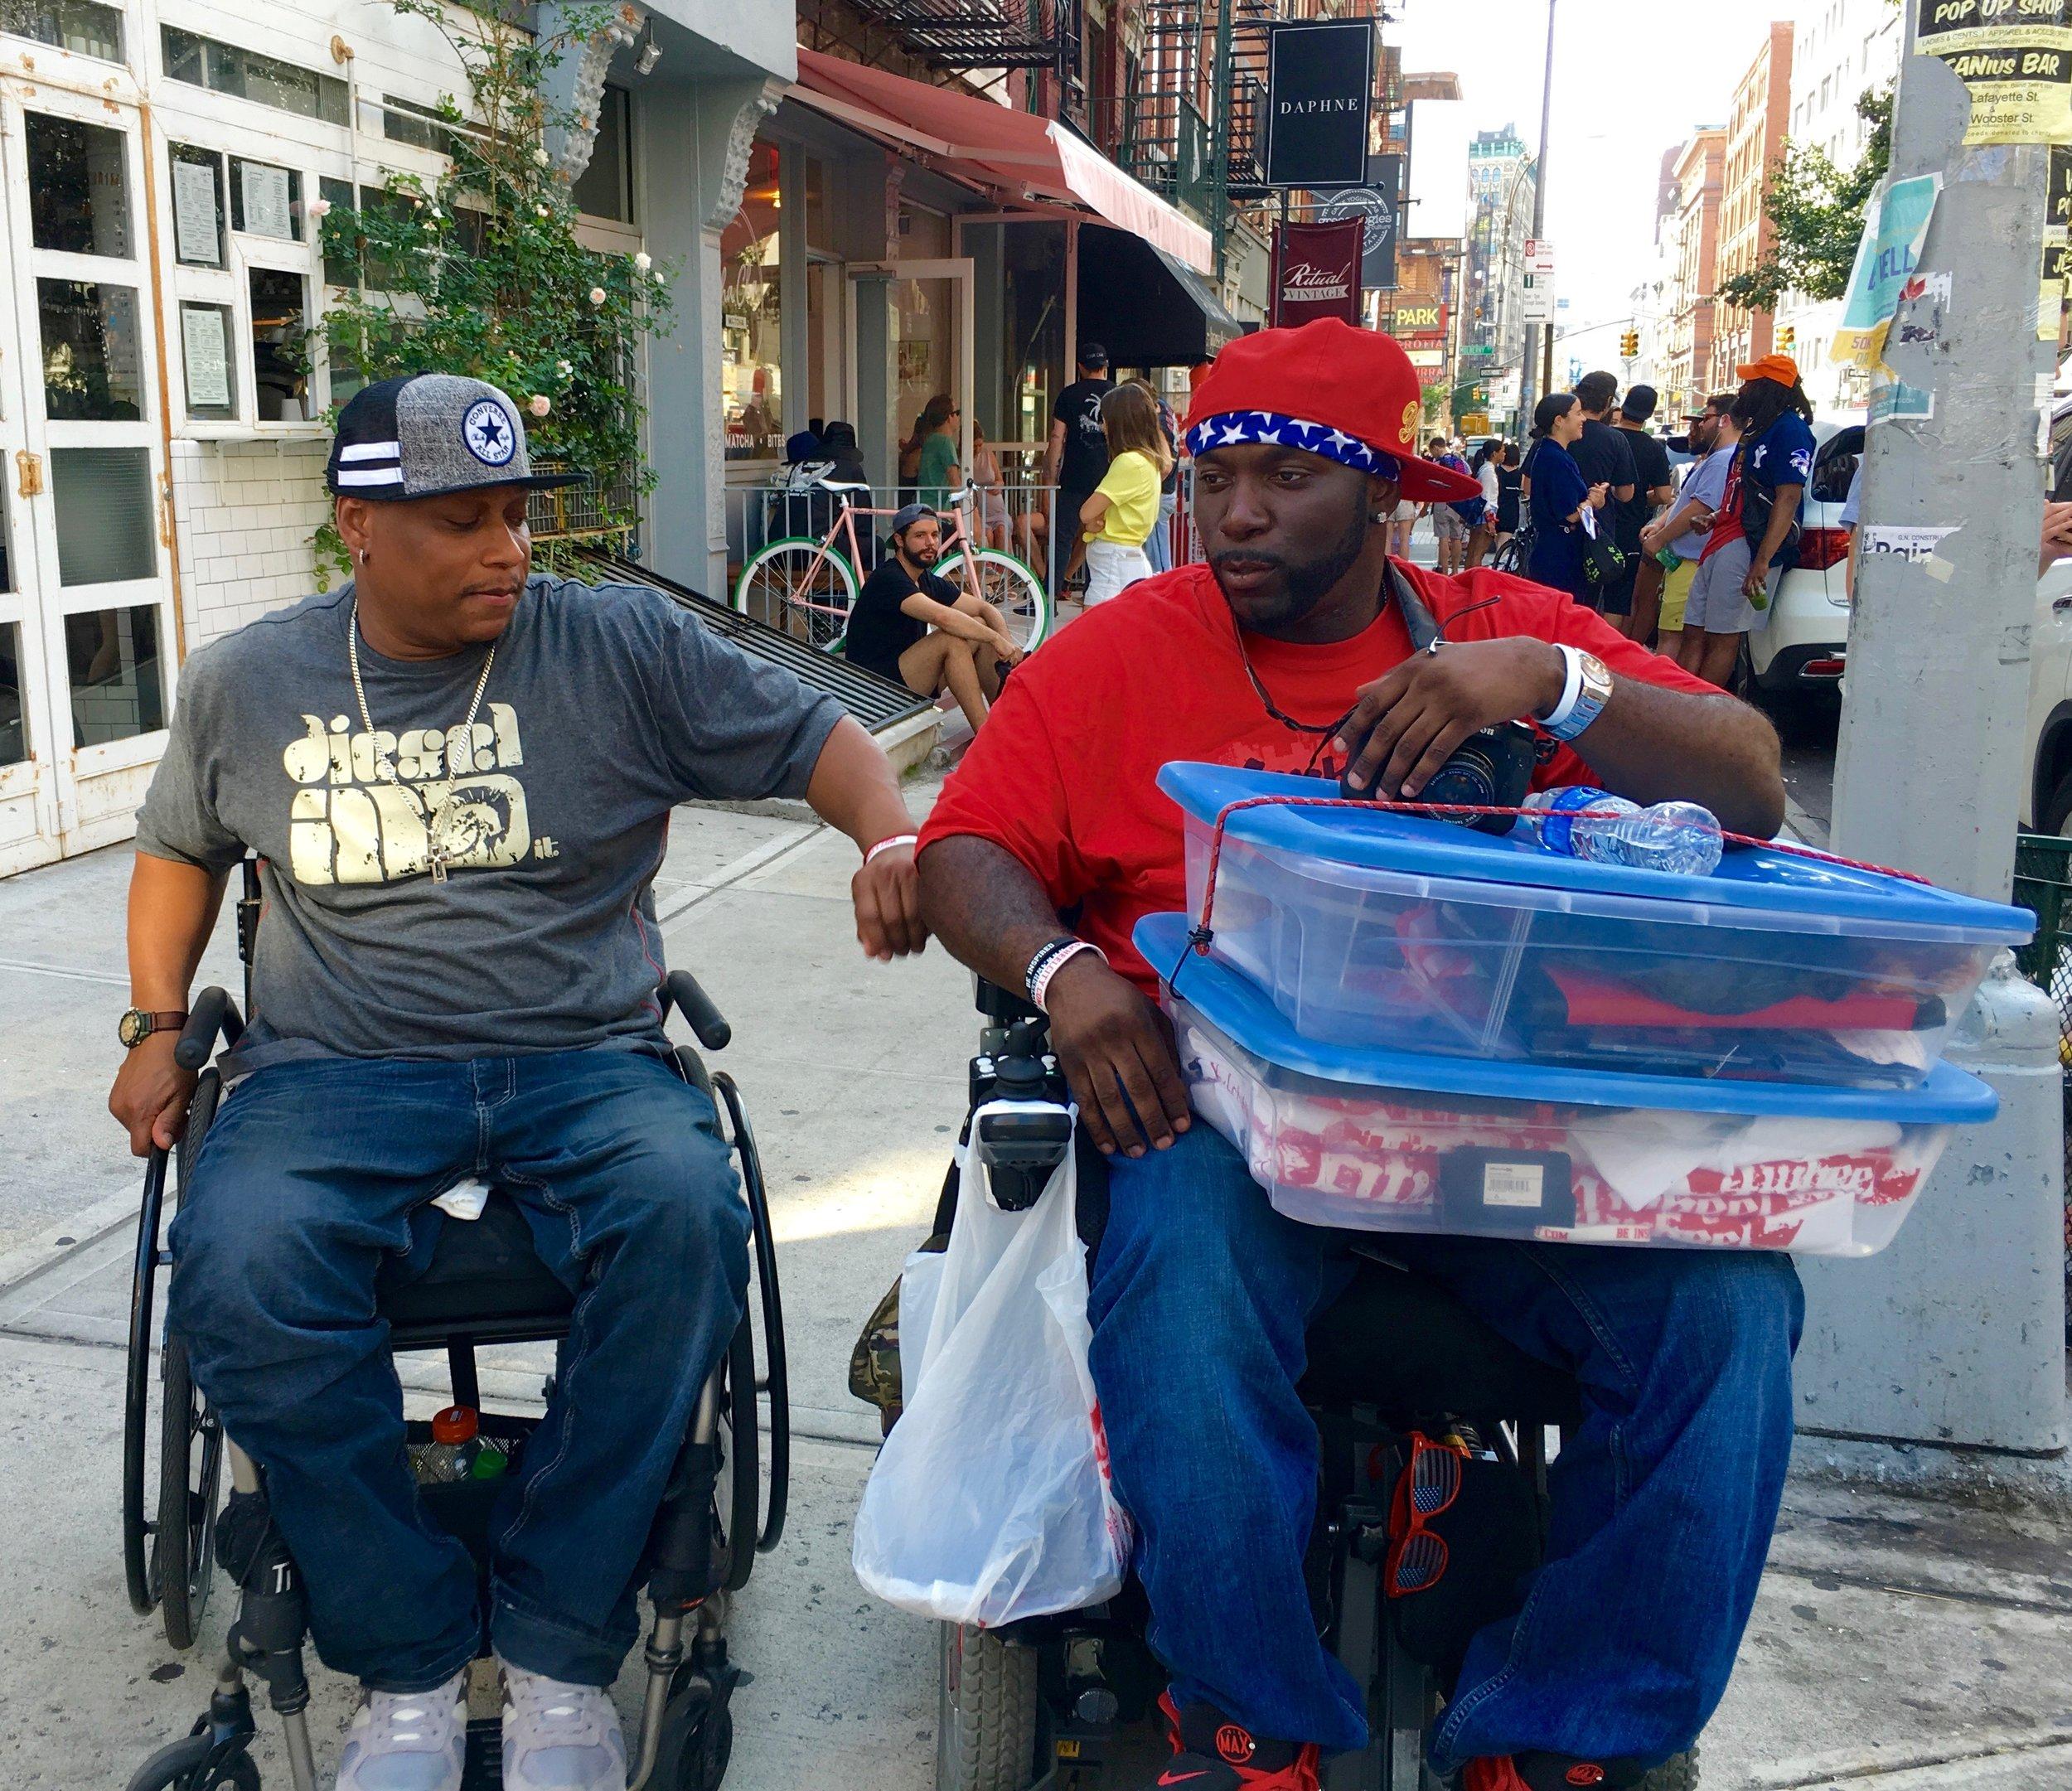 4 Wheel City in New York's Soho neighborhood. Photograph: Adrian Brune